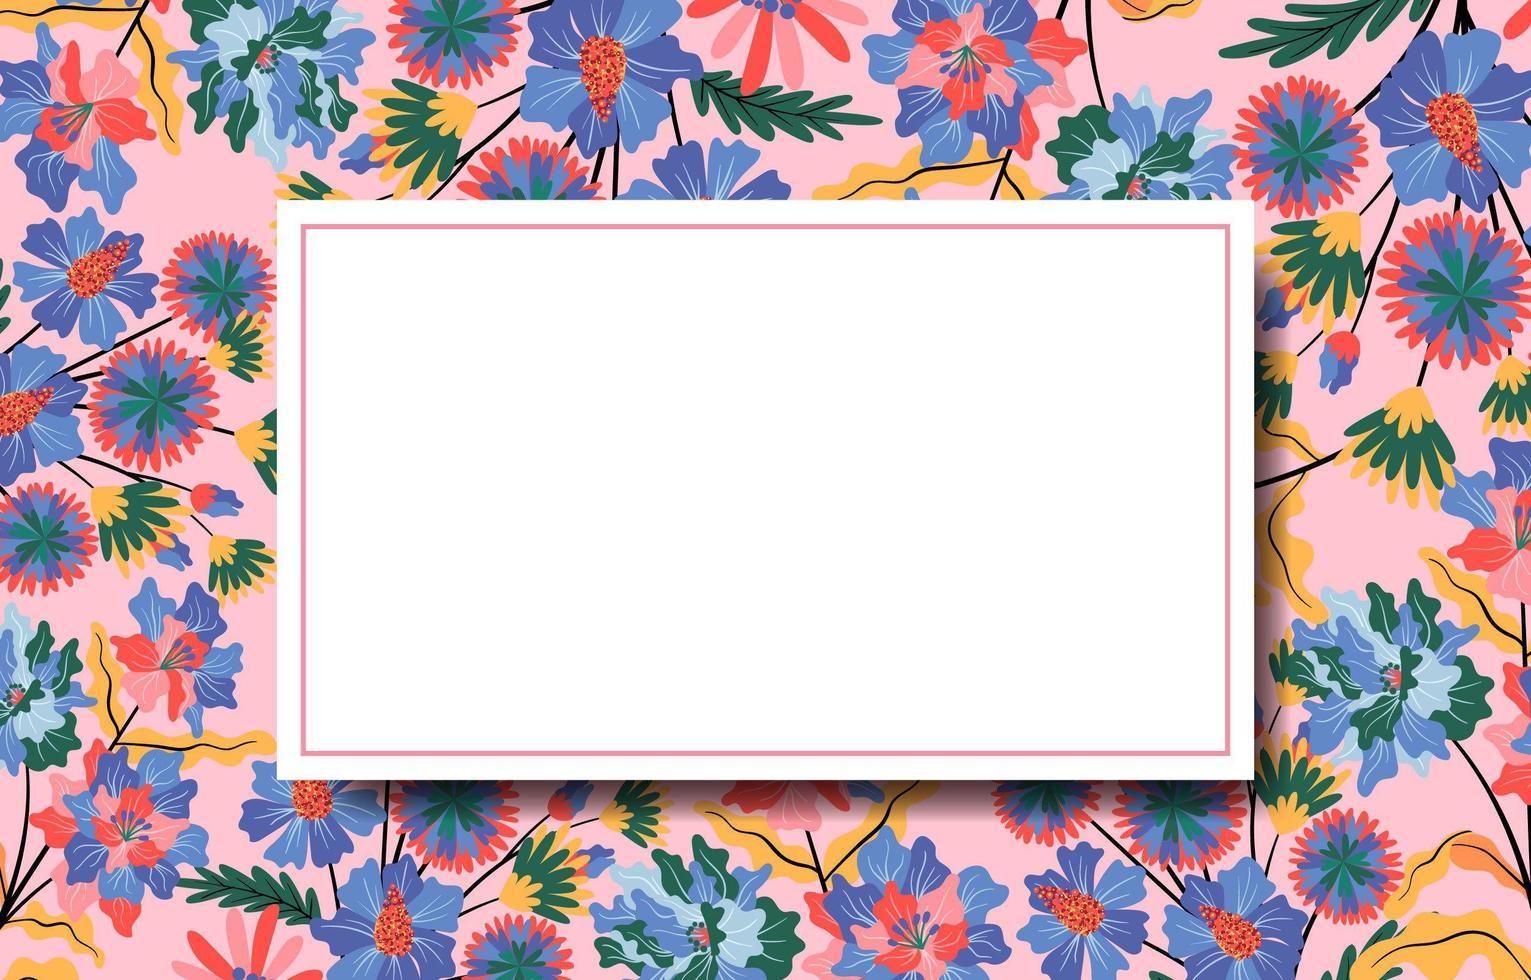 naturlig blommig bakgrund med vit ram i mitten vektor